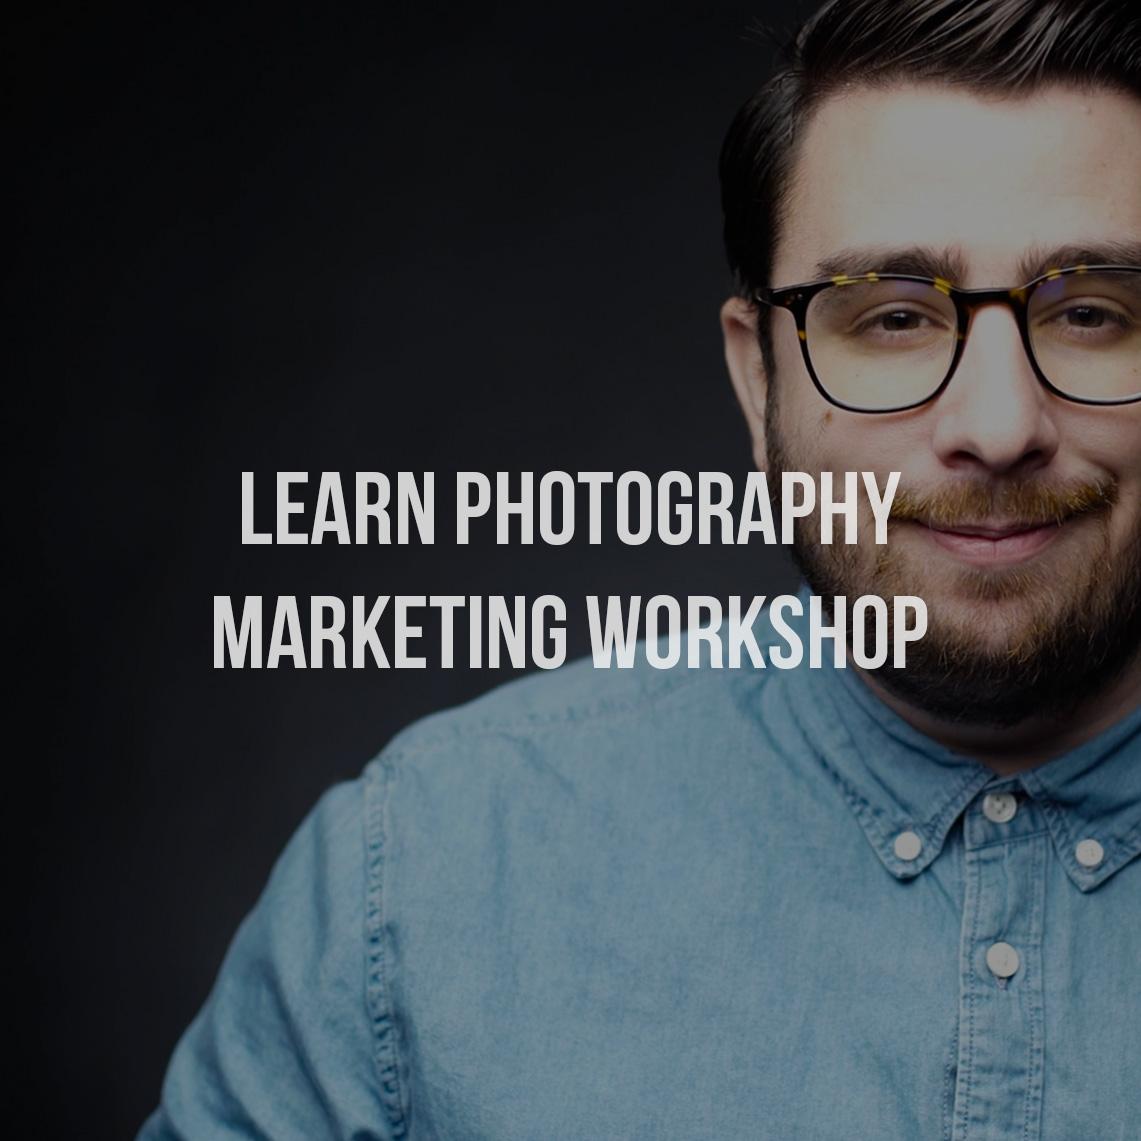 learn photography marketing workshop.jpg